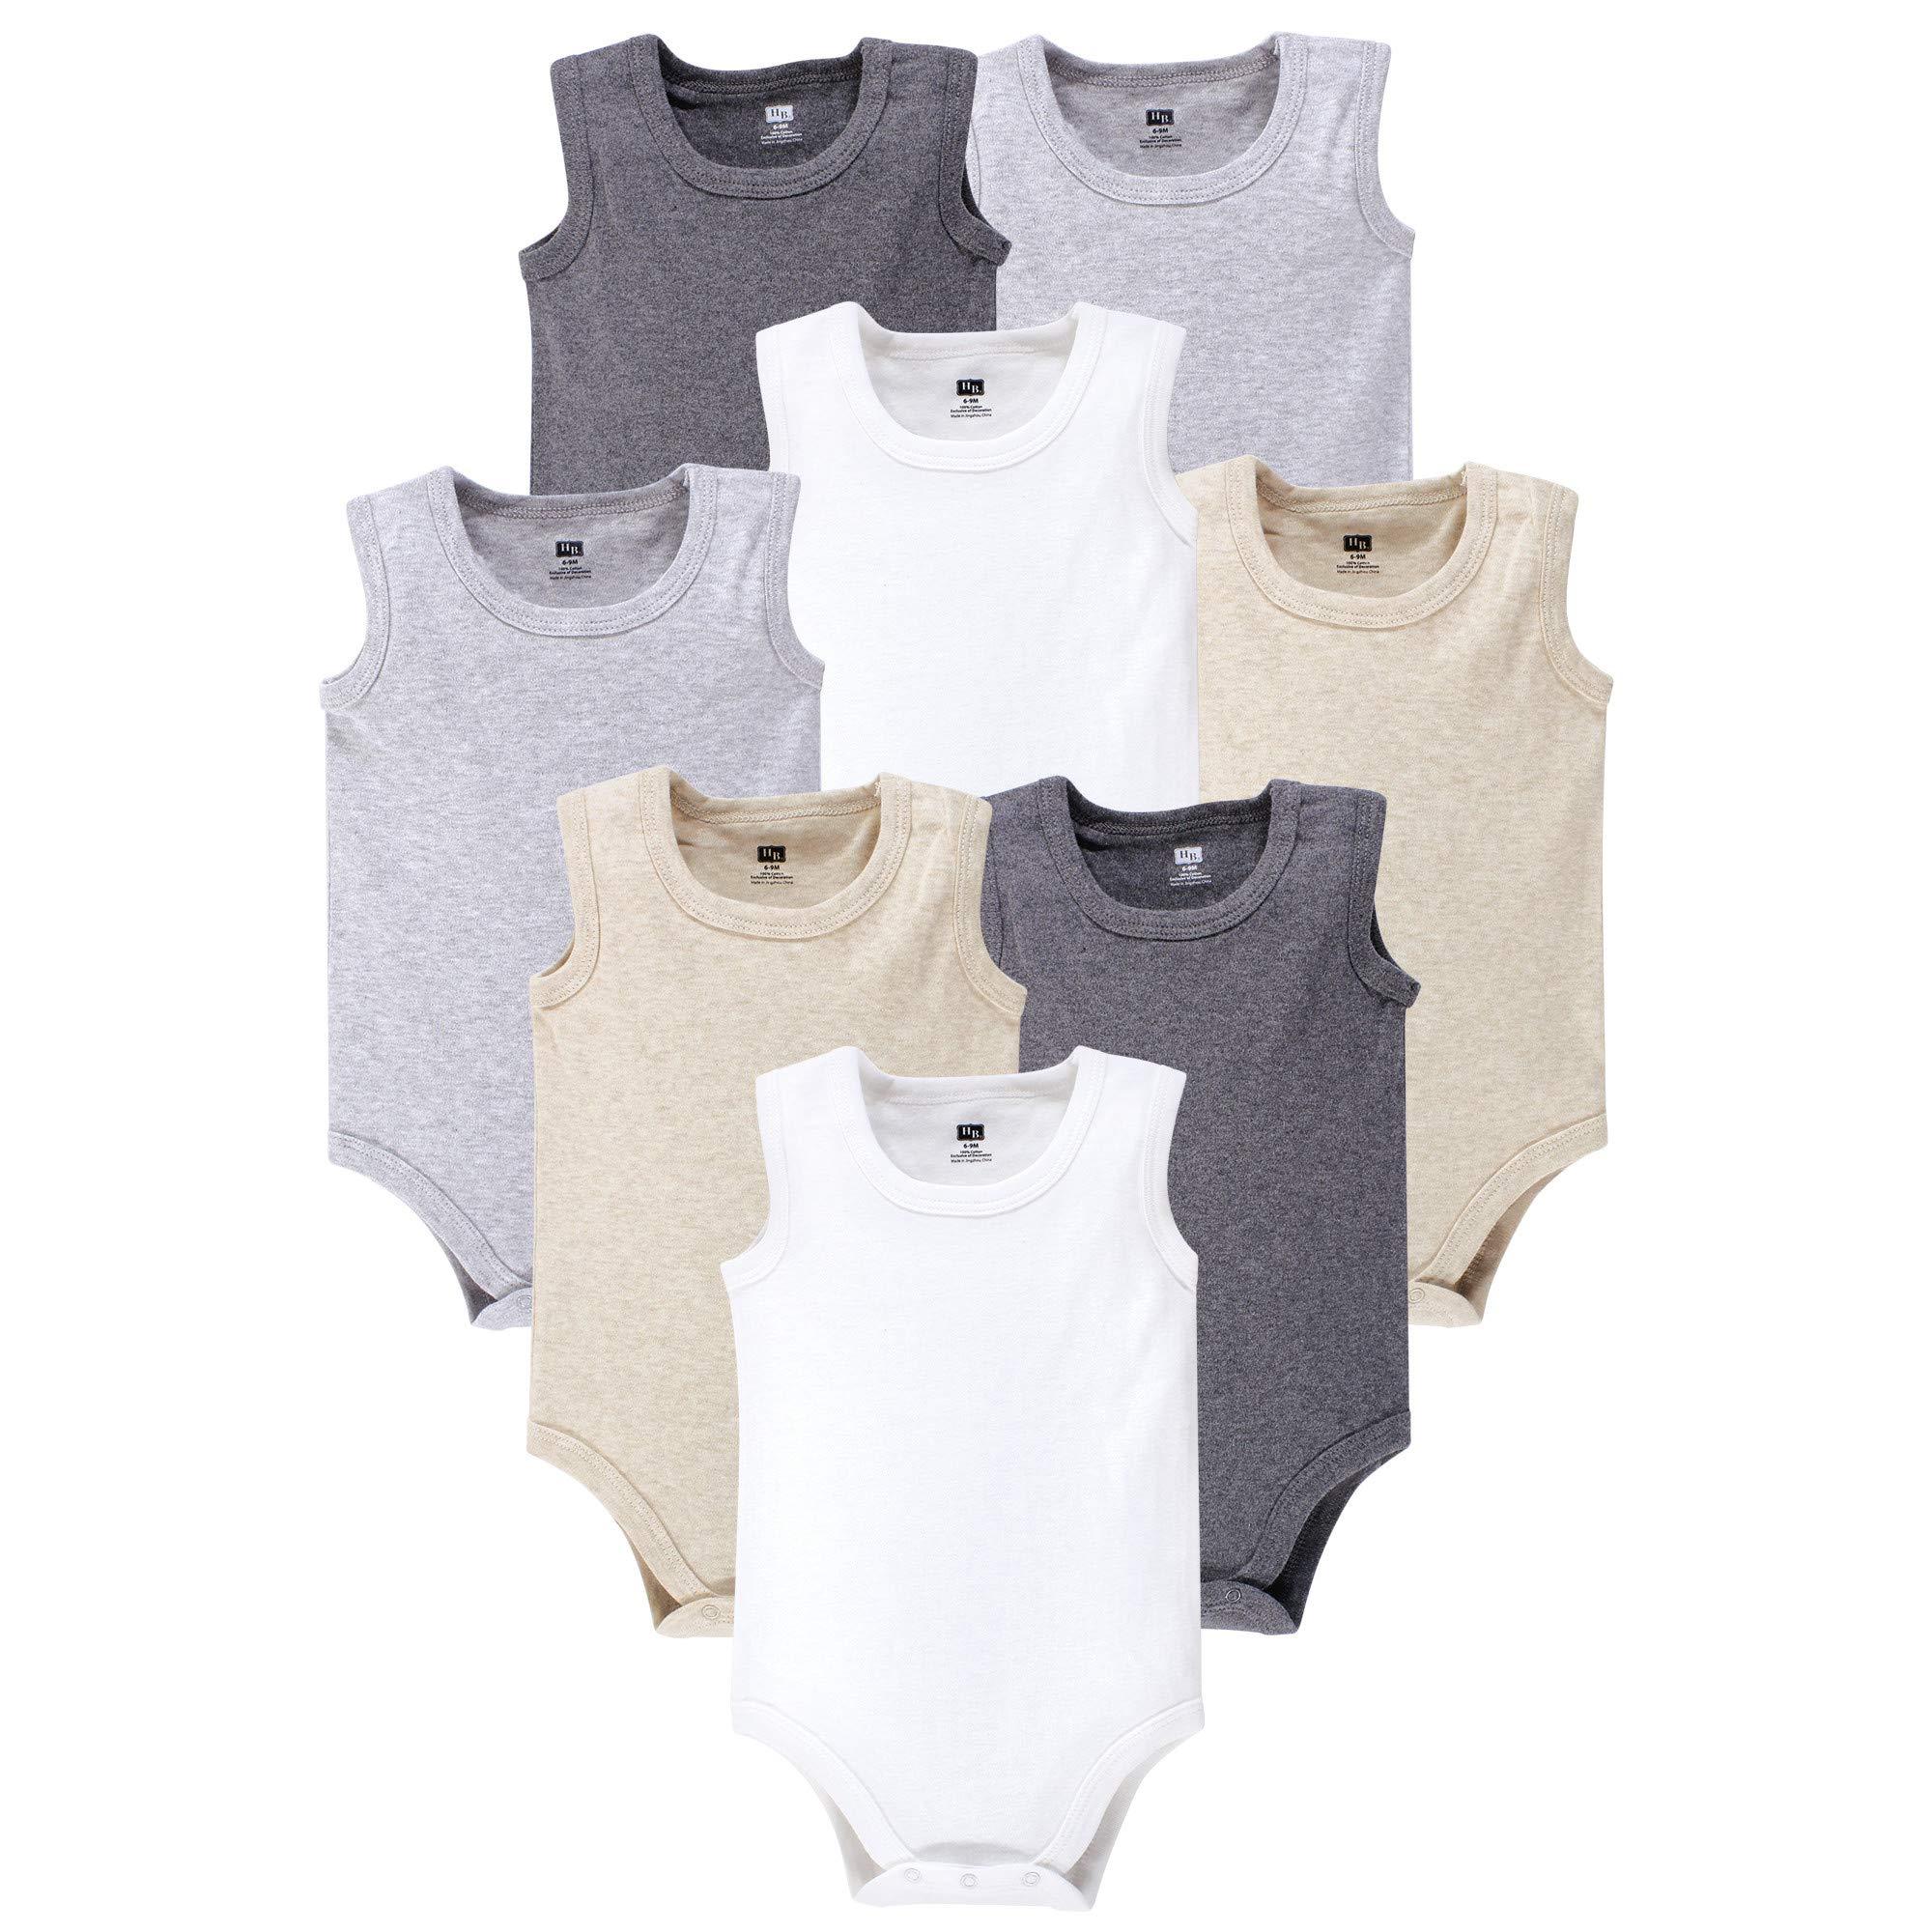 Hudson Baby Baby Sleeveless Bodysuits, Heather Gray 8-Pack, 0-3 Months (3M)